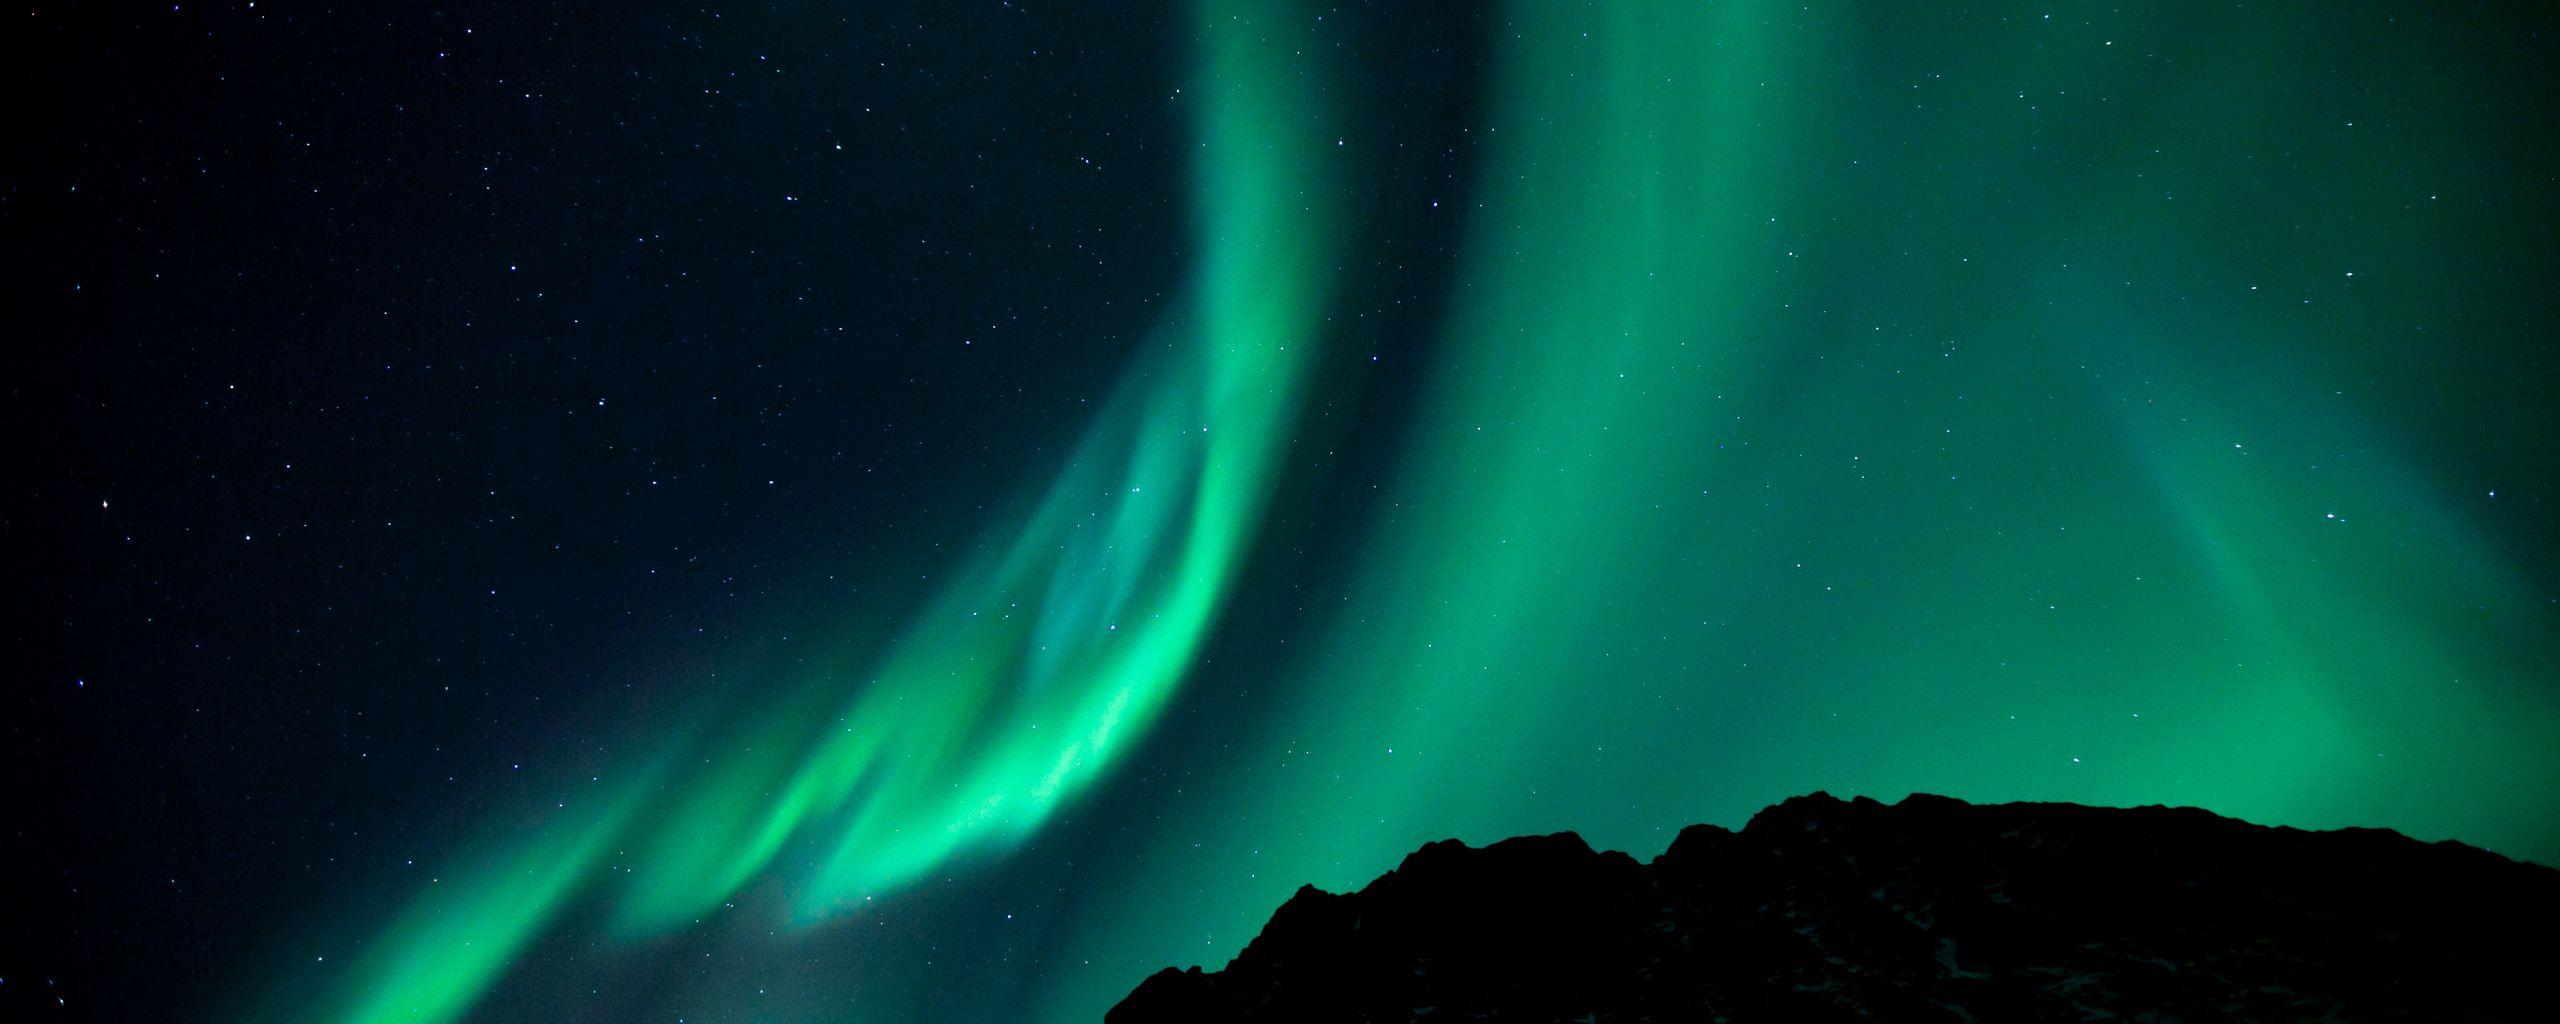 2560x1024 Wallpaper northern lights, night, night sky, phenomenon